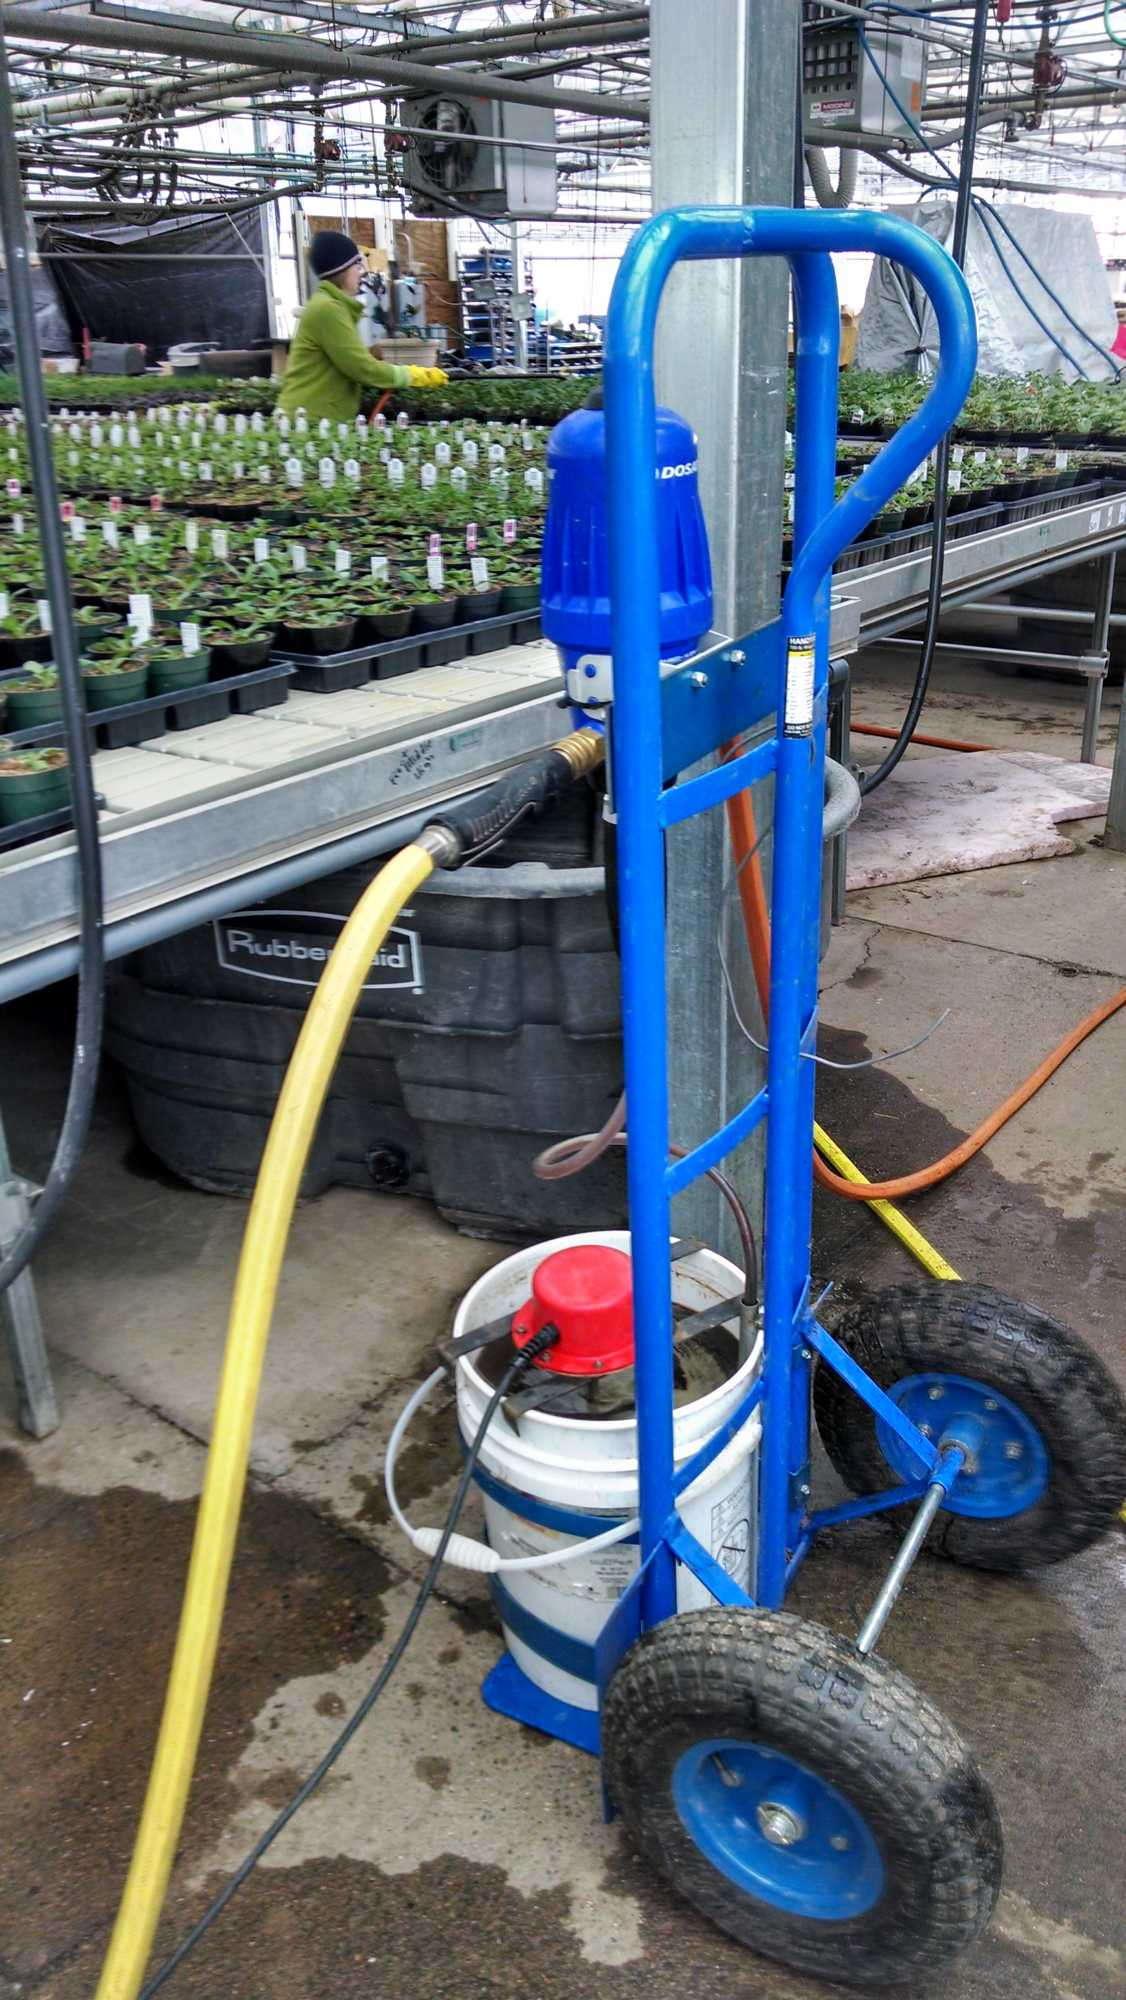 Pork & Plants uses Dosatron injectors to apply nematode drenches.